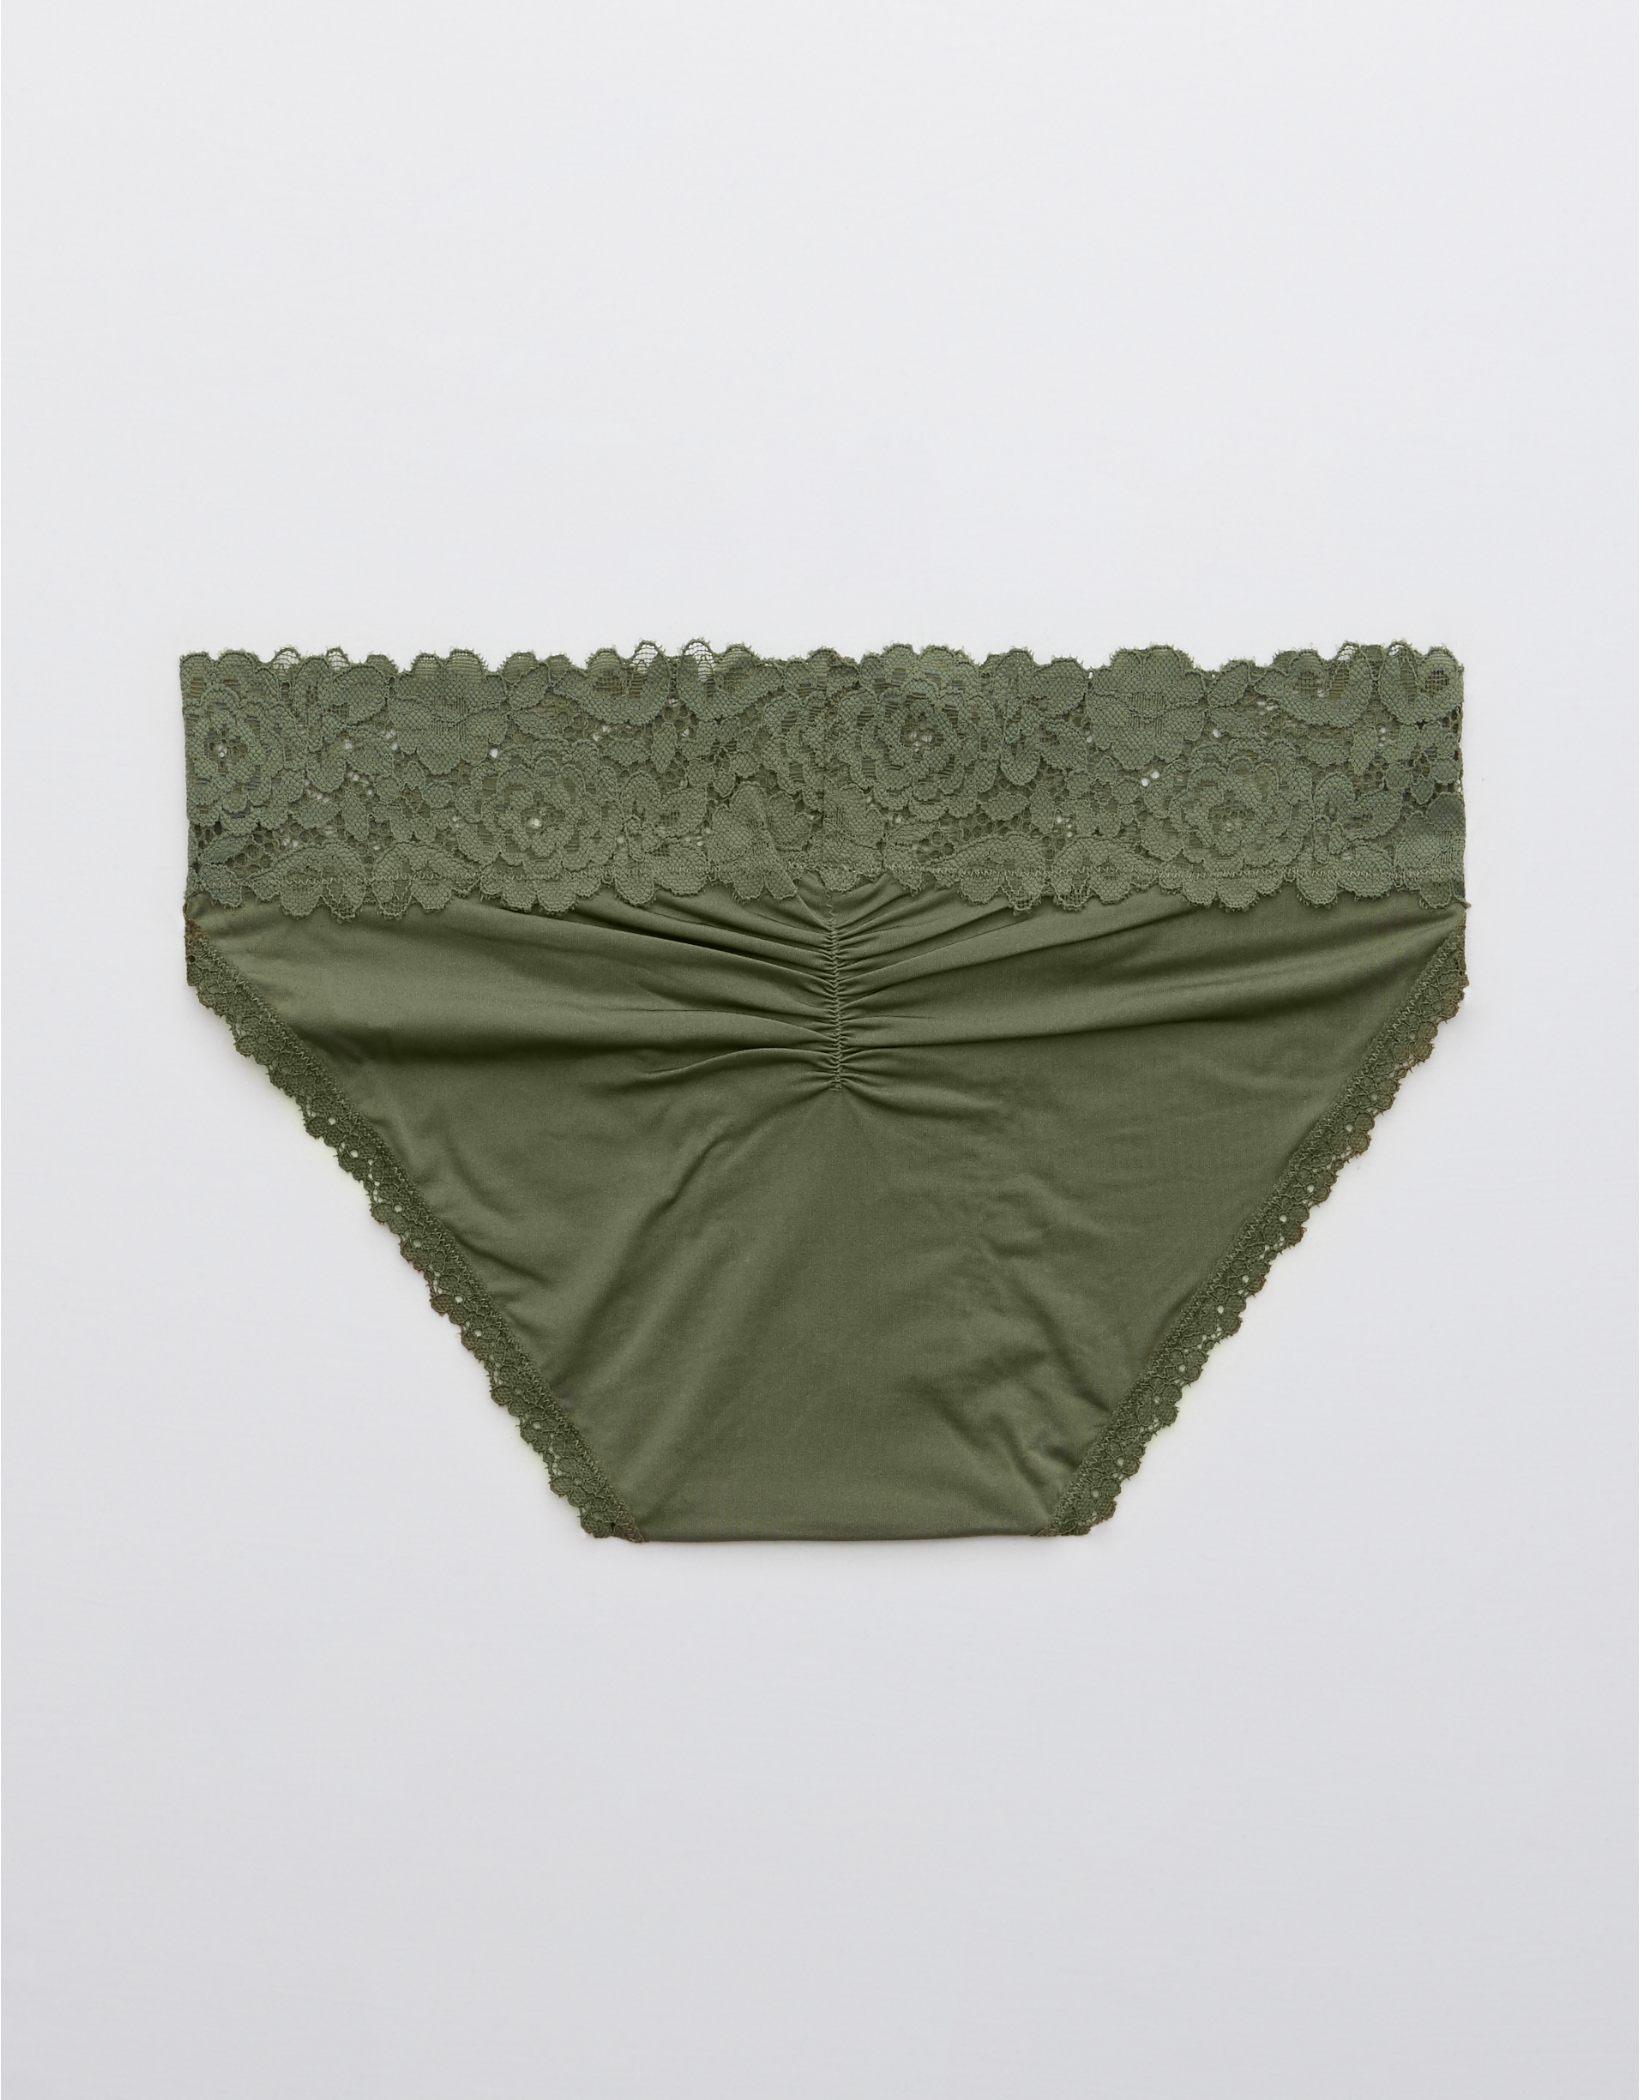 Aerie Bluegrass Lace Shine Bikini Underwear